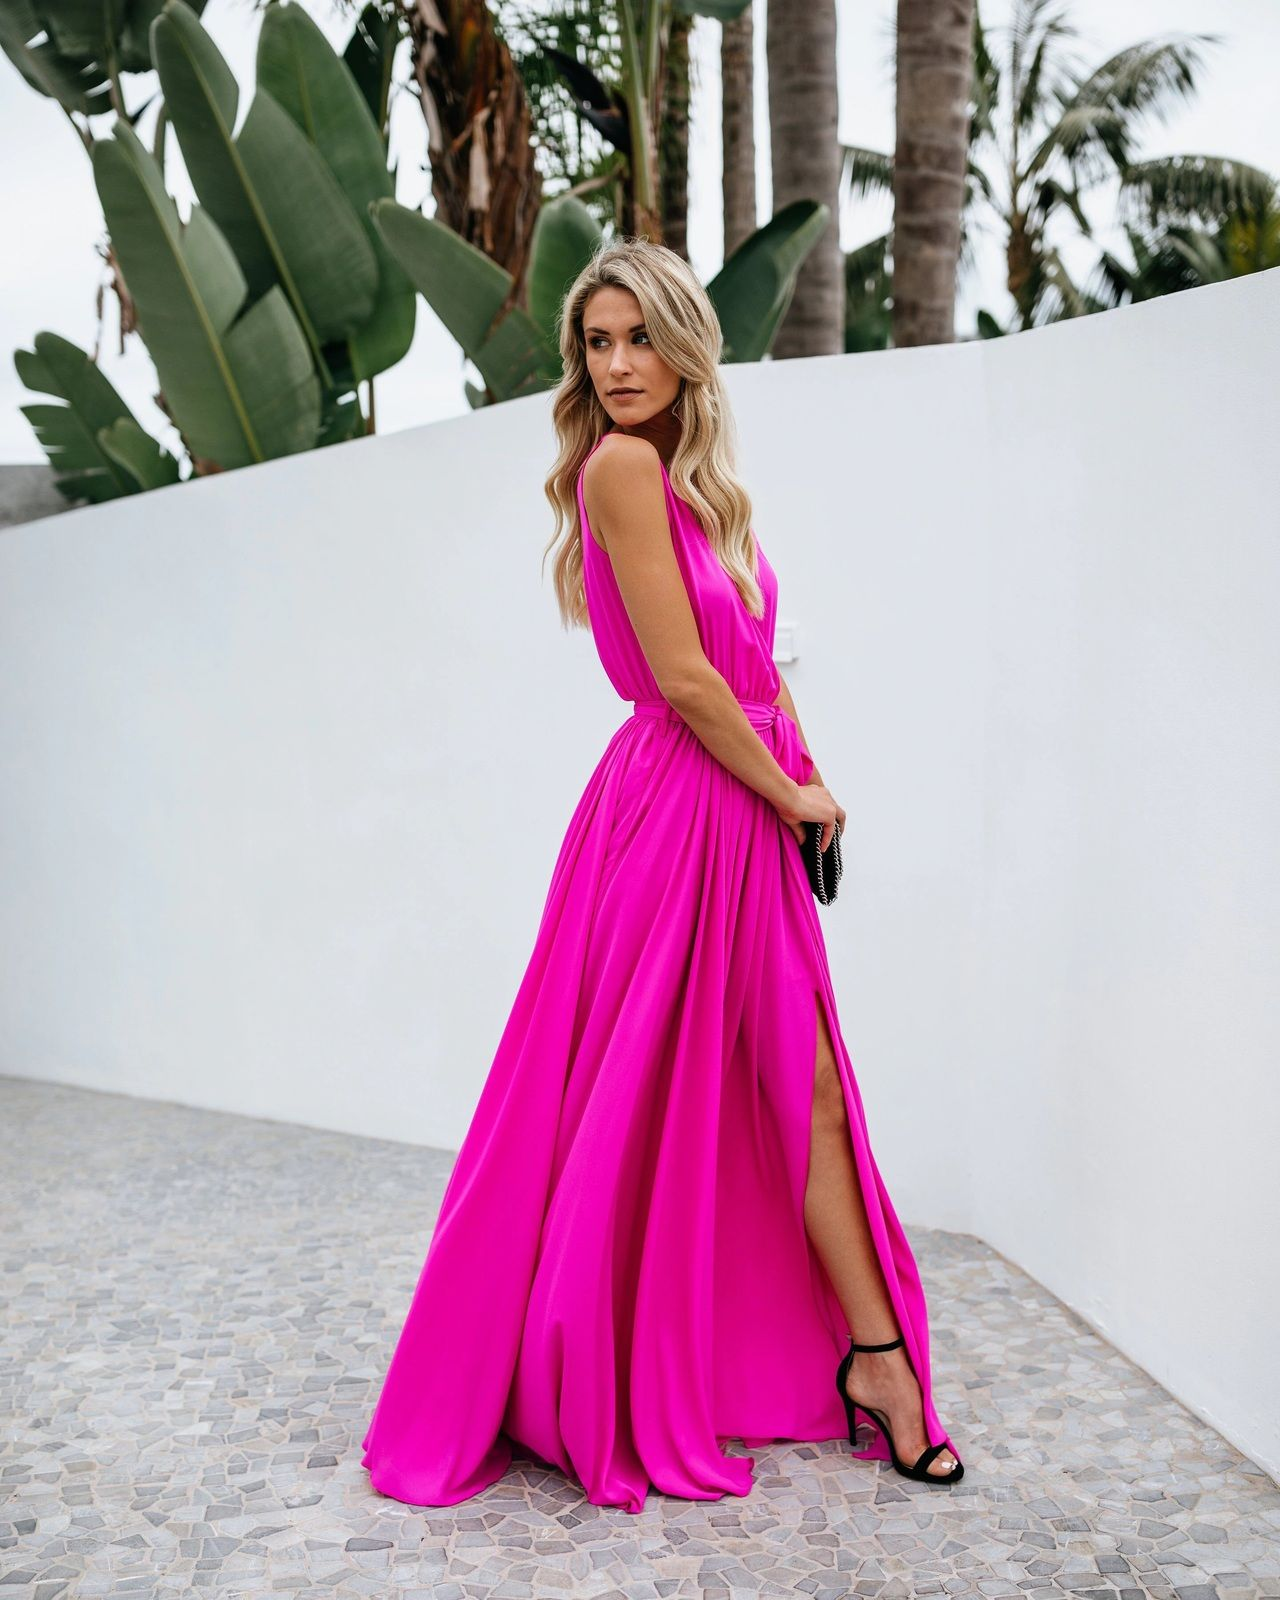 Click On The Photo To Shop This Beautiful Pink Maxi Dress New Fuchsia Pink V Neck Belt Women M Elegant Summer Dresses Spring Dresses Casual Beach Maxi Dress [ 1600 x 1280 Pixel ]